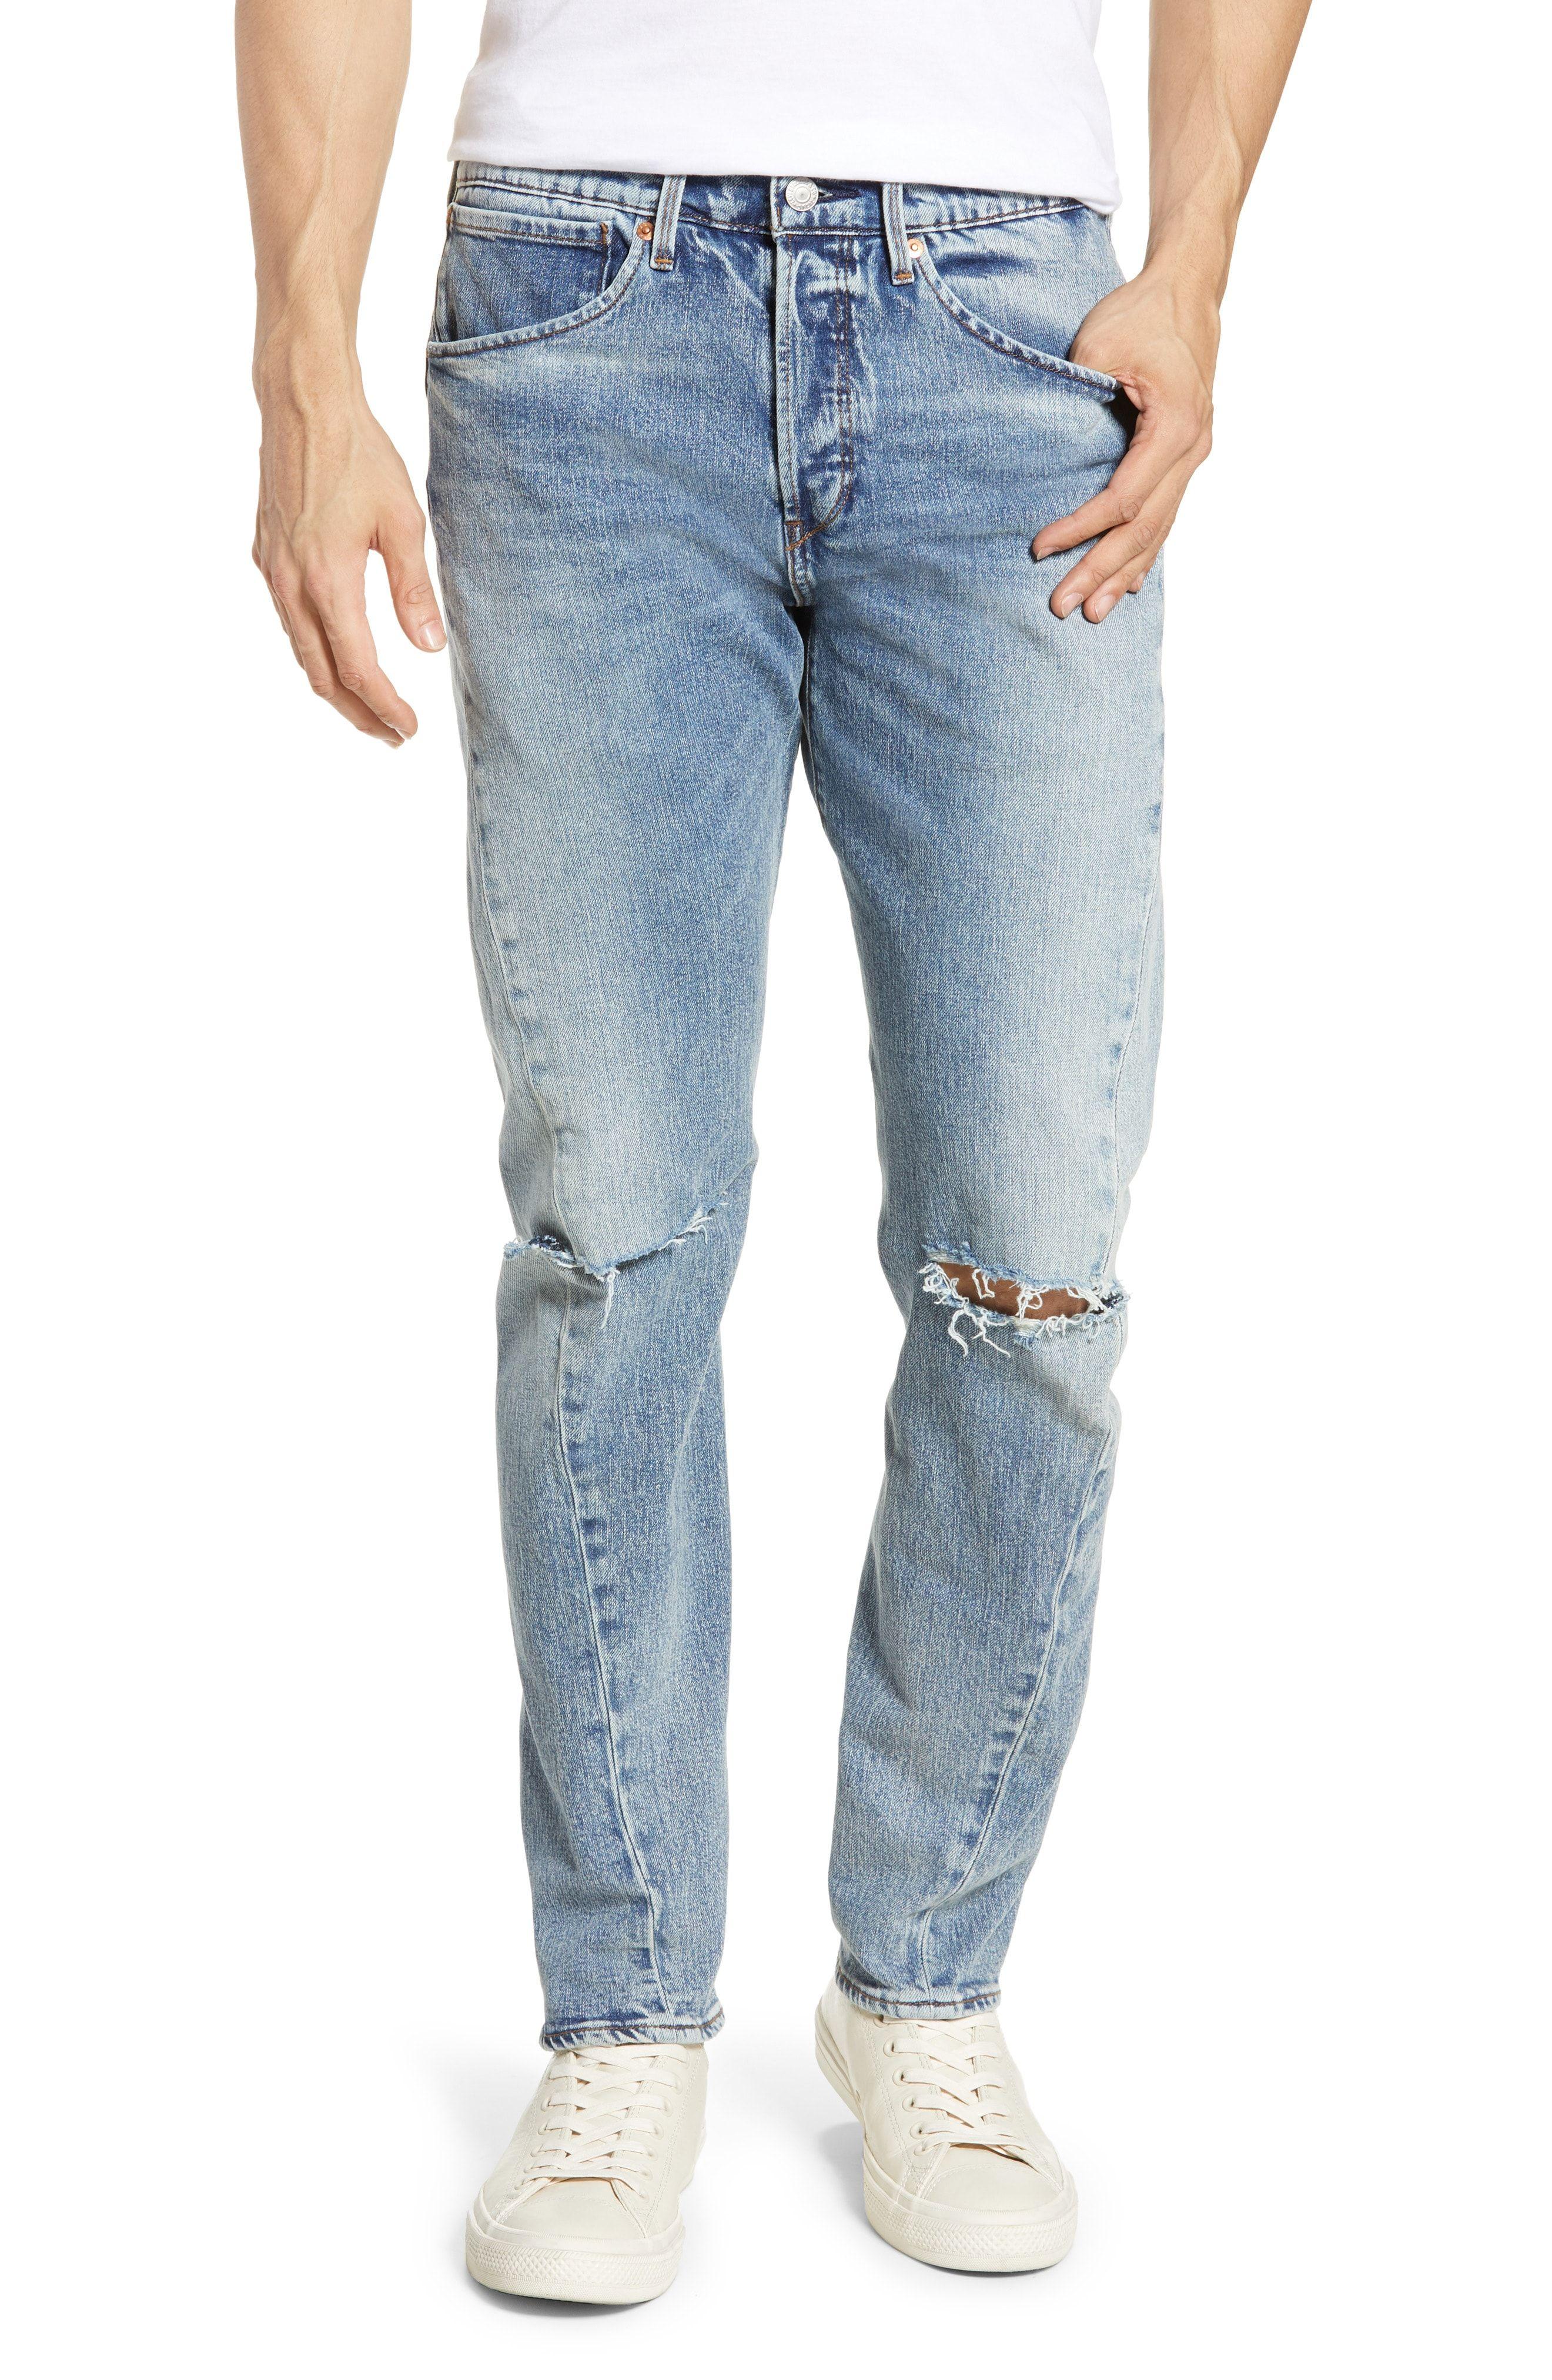 35573f49 LEVI'S ENGINEERED JEANS(TM) STRAIGHT LEG JEANS. #levis #cloth ...